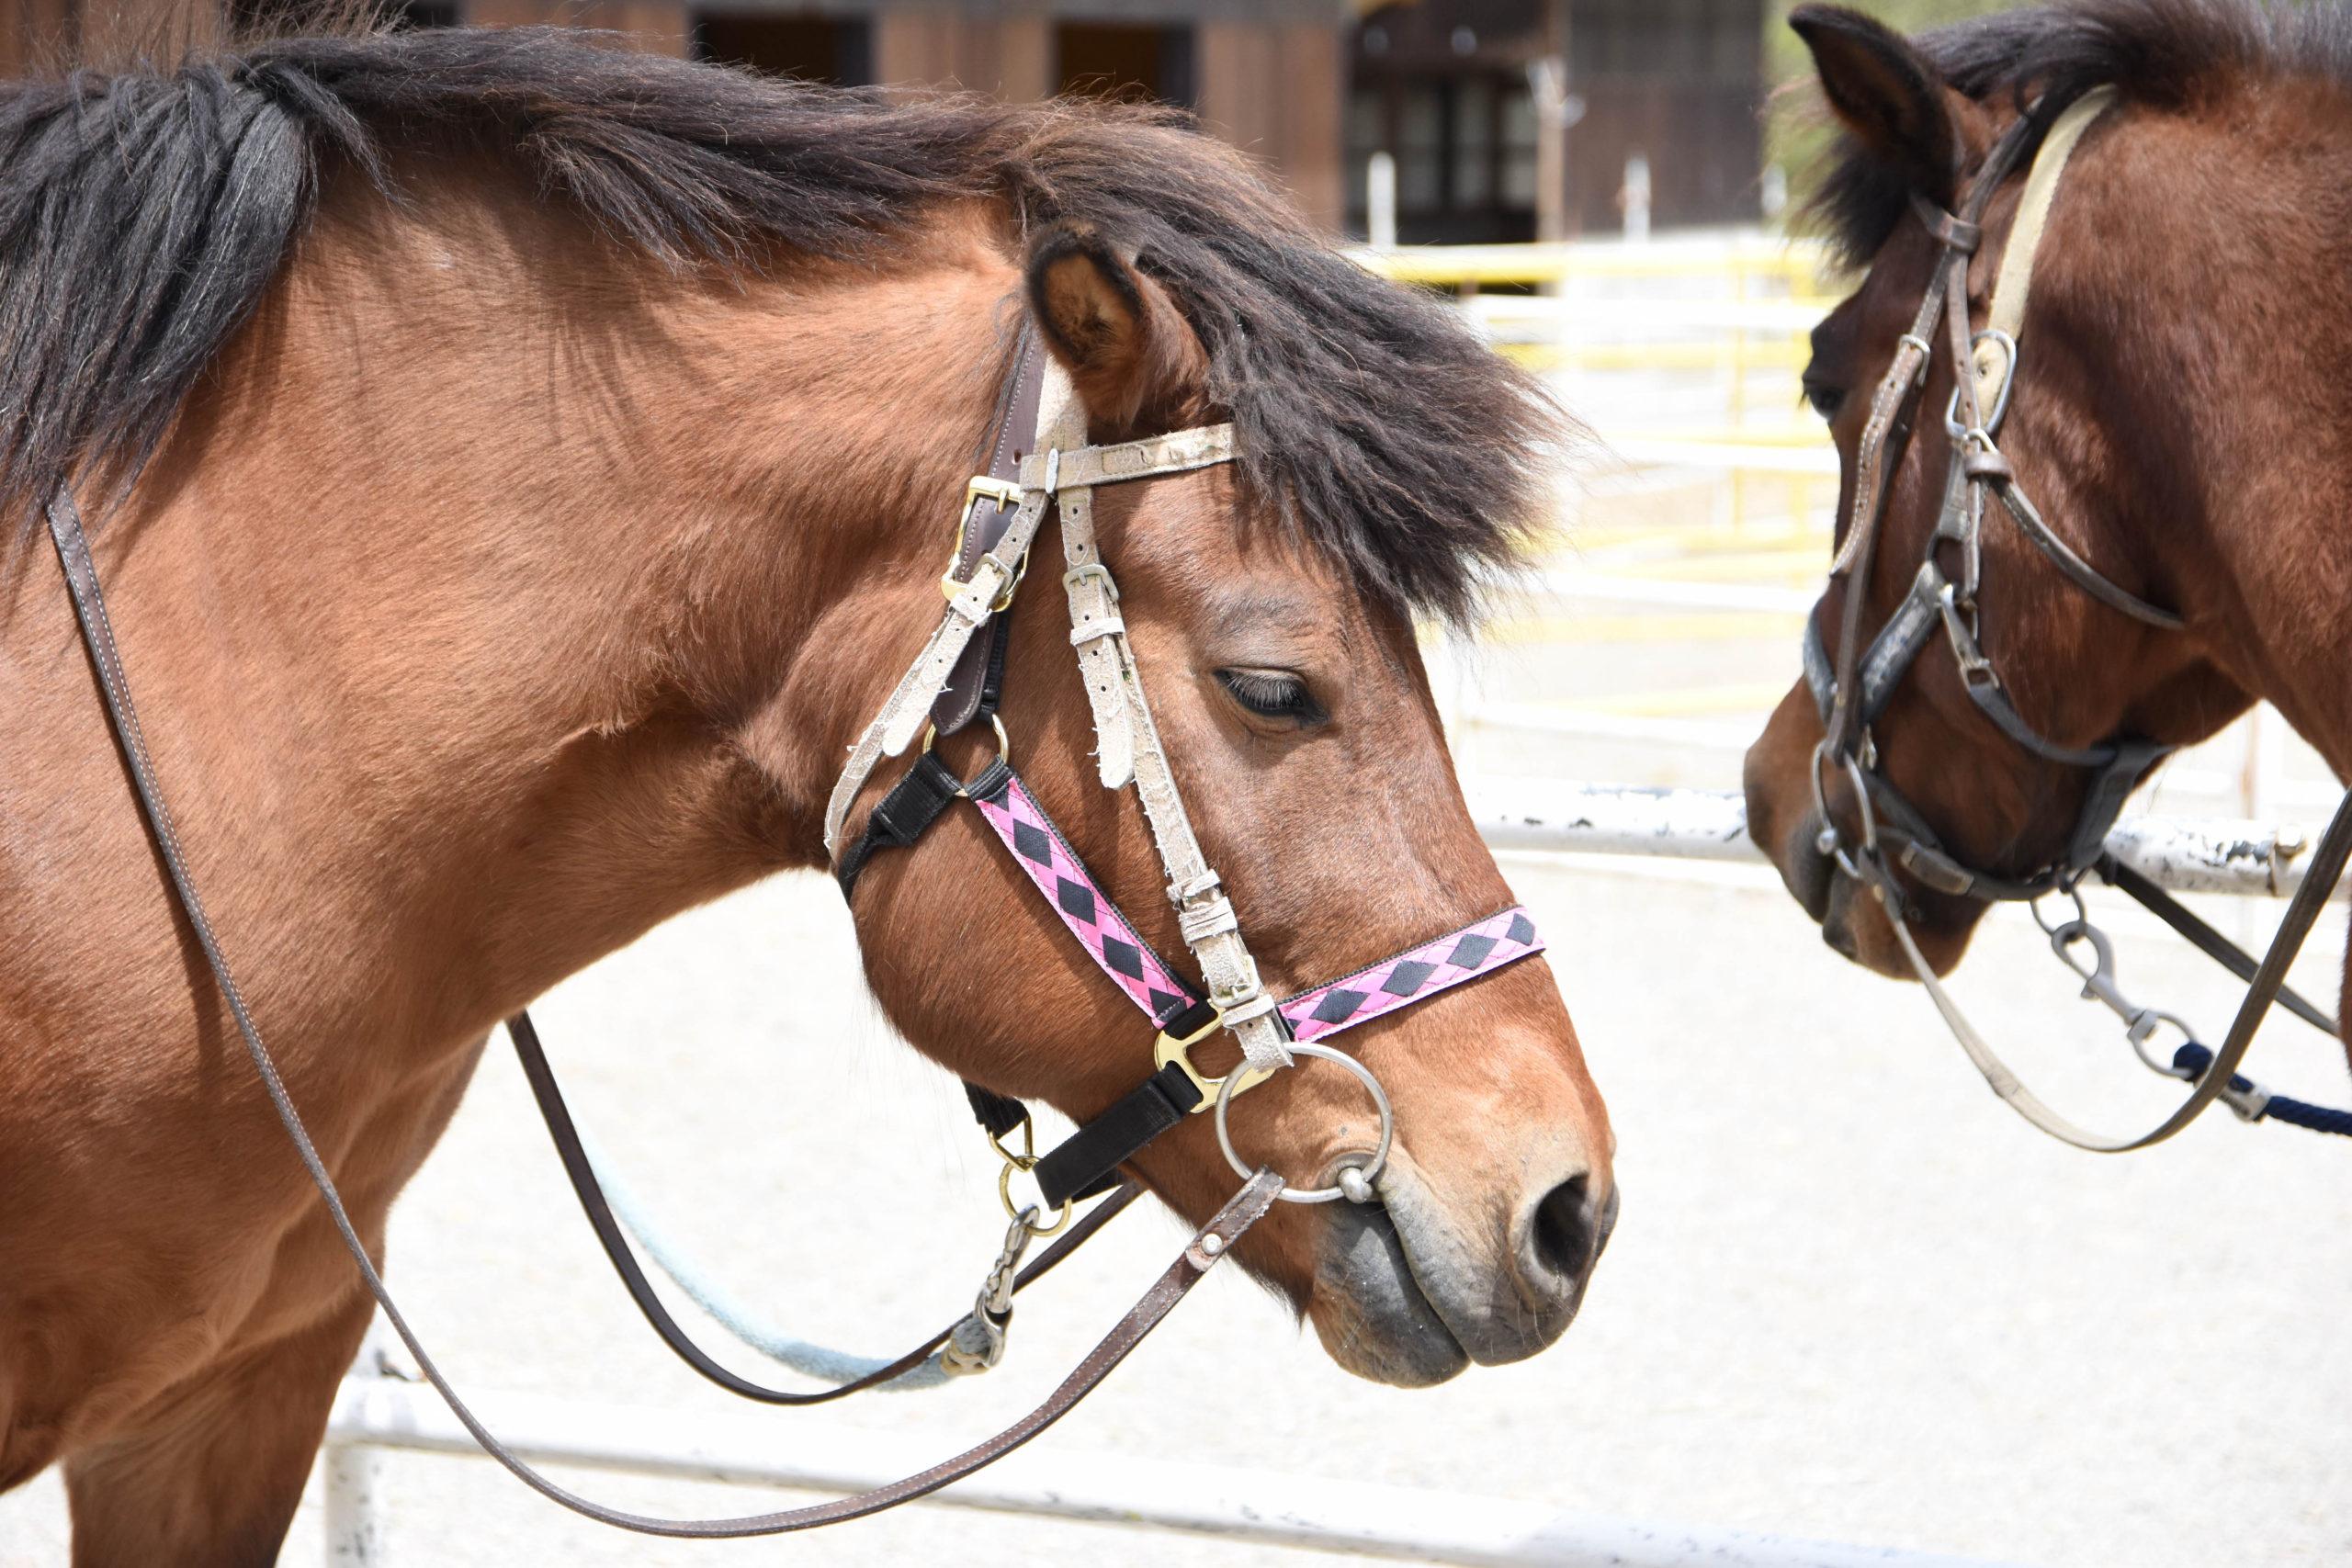 <T_018>ひるがの高原の大自然の中を「木曽馬」に乗ってのんびりお散歩 サムネイル